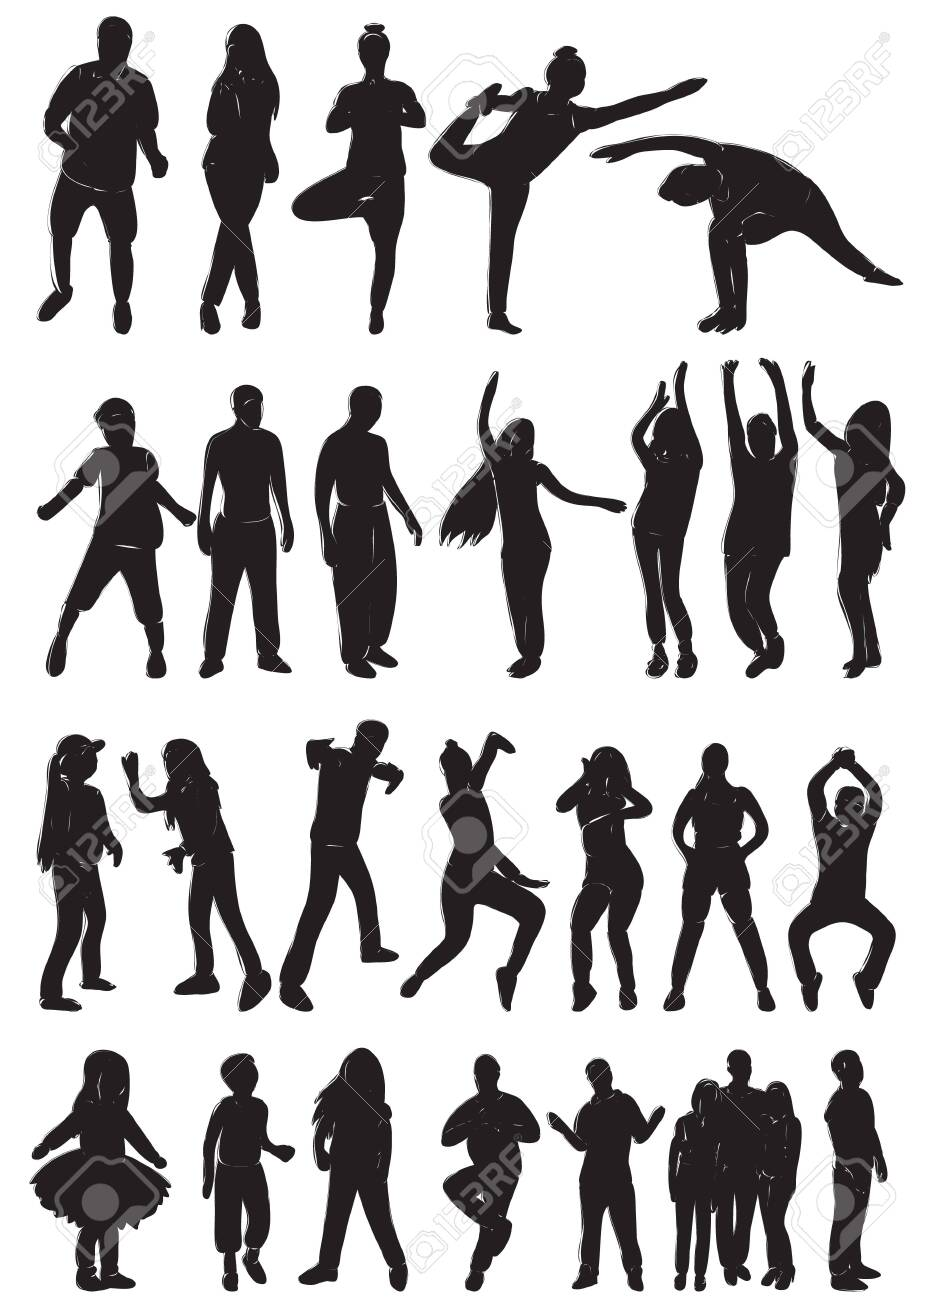 silhouette of dancing people set - 150132984